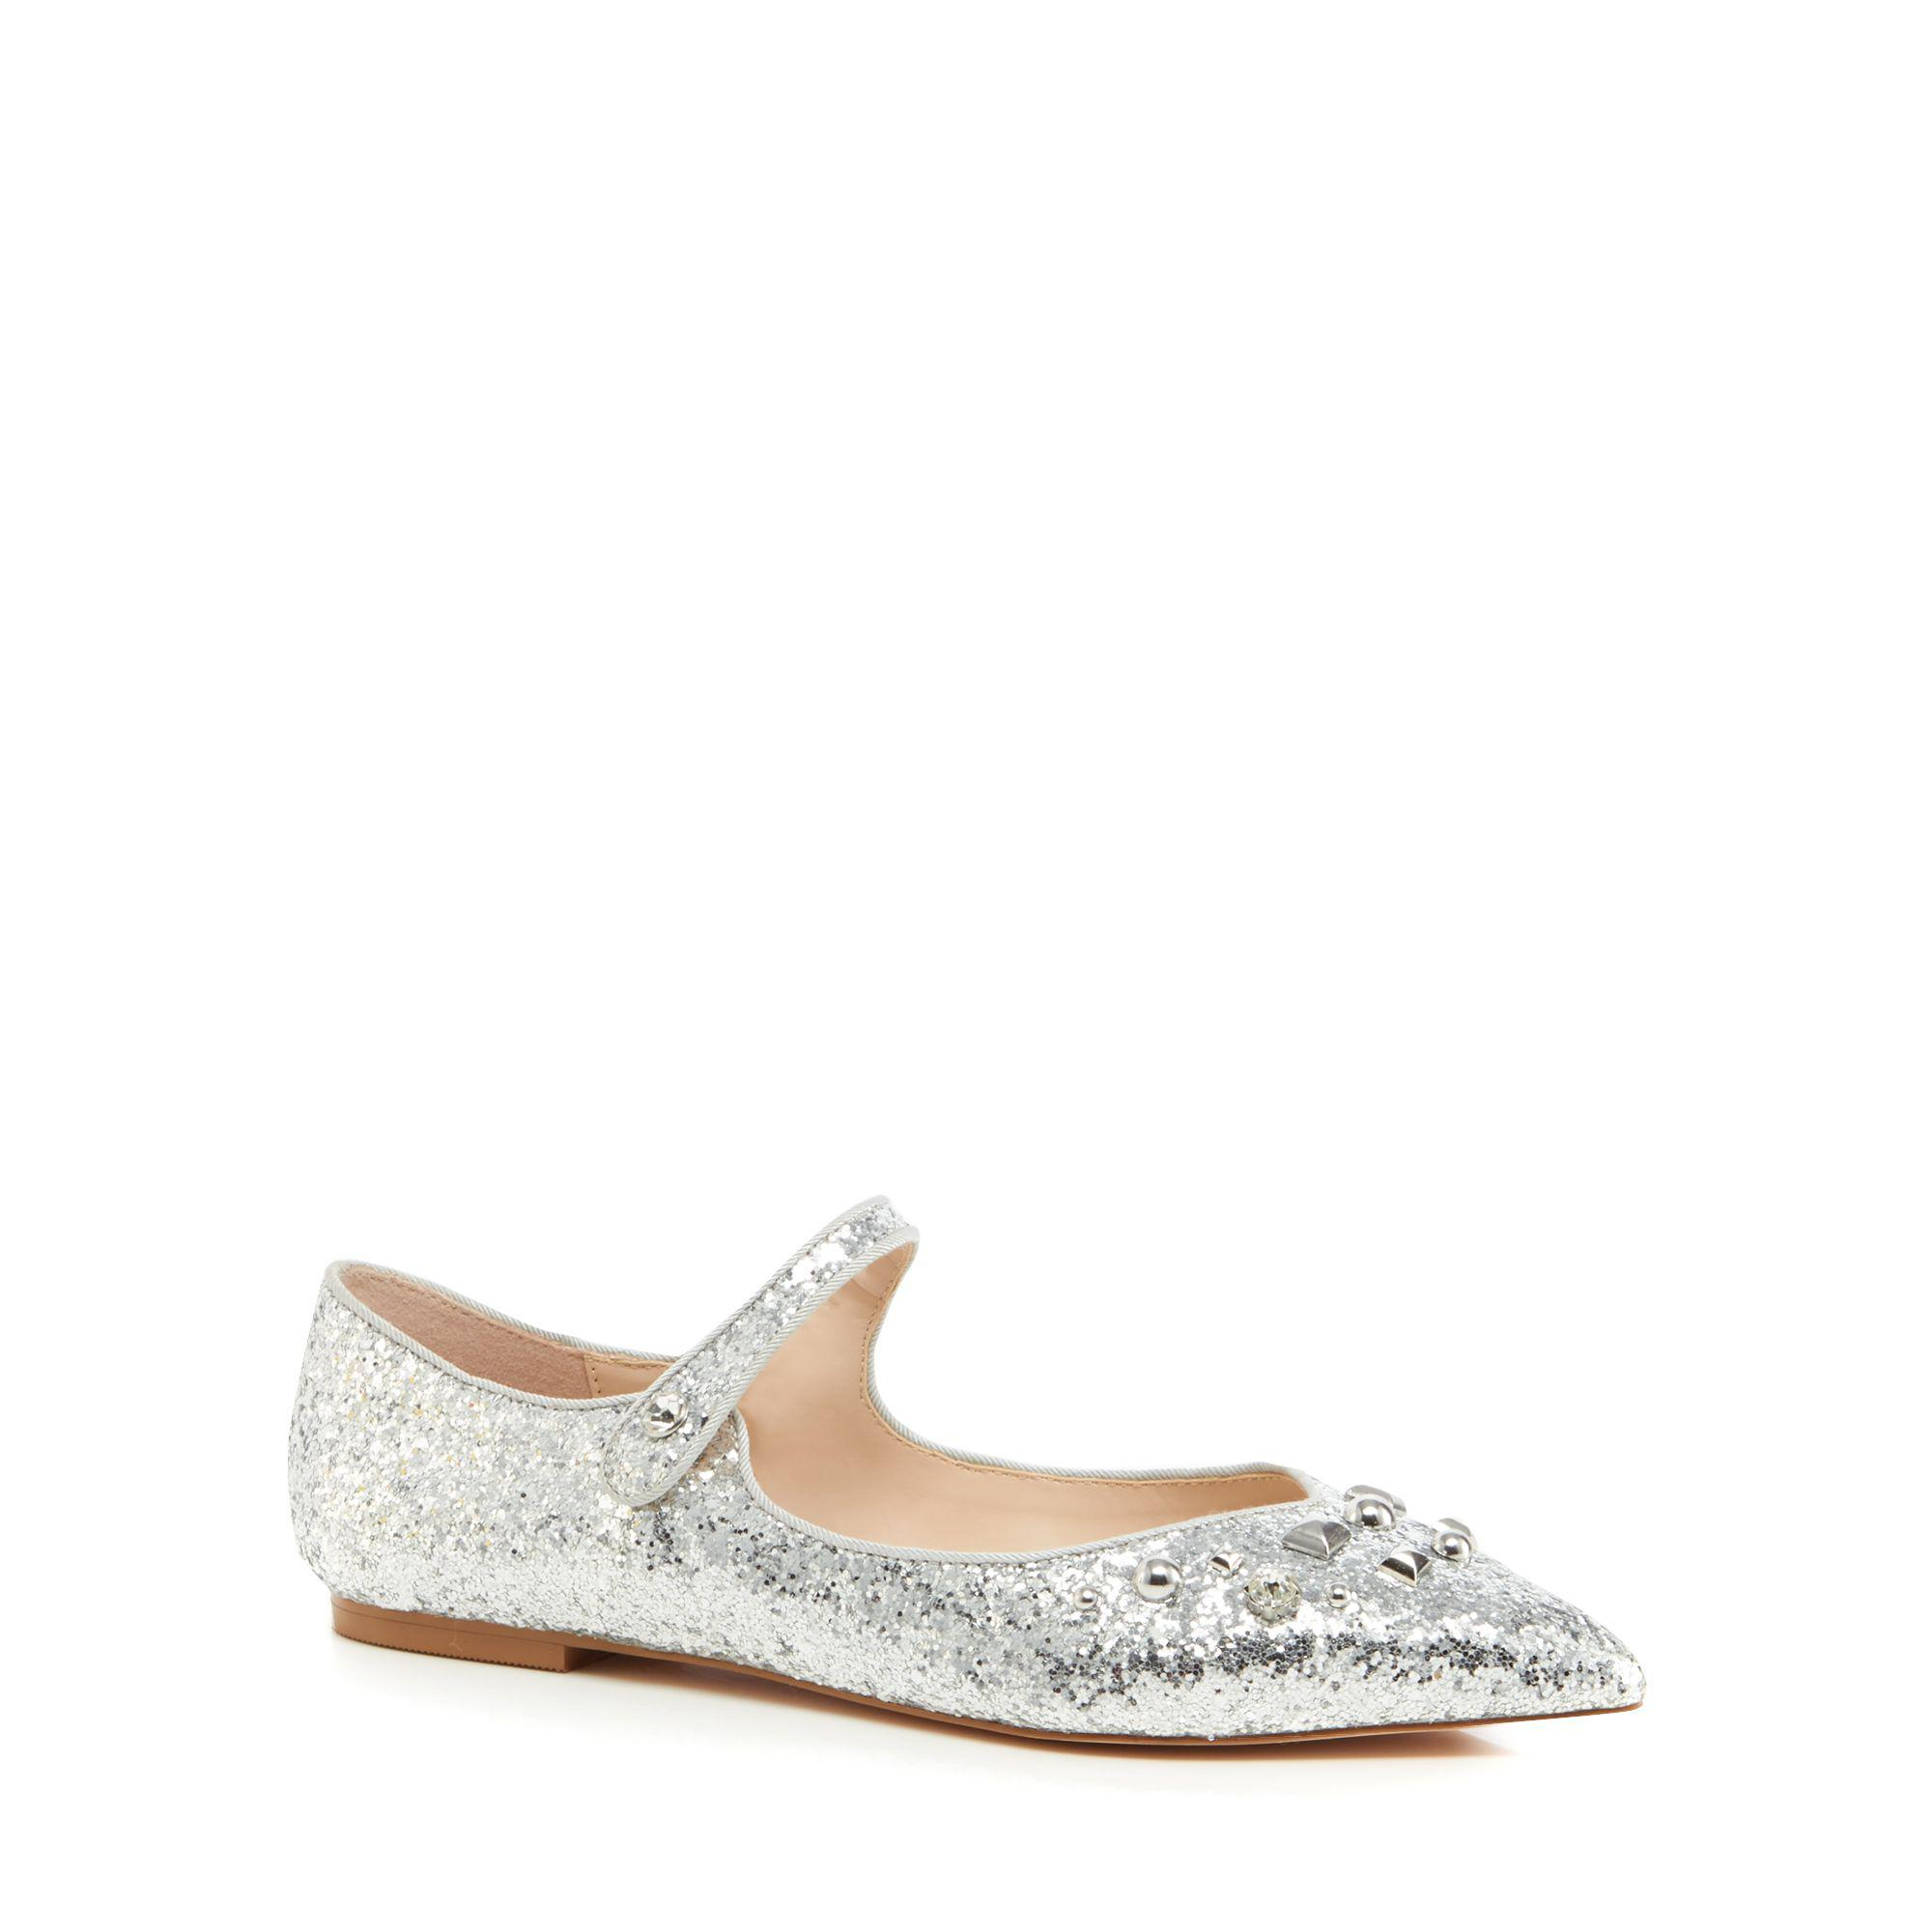 0941b7a31e Glitter Metallic Lyst Faith Shoes  abi  Silver In Pointed eD29EWYHI